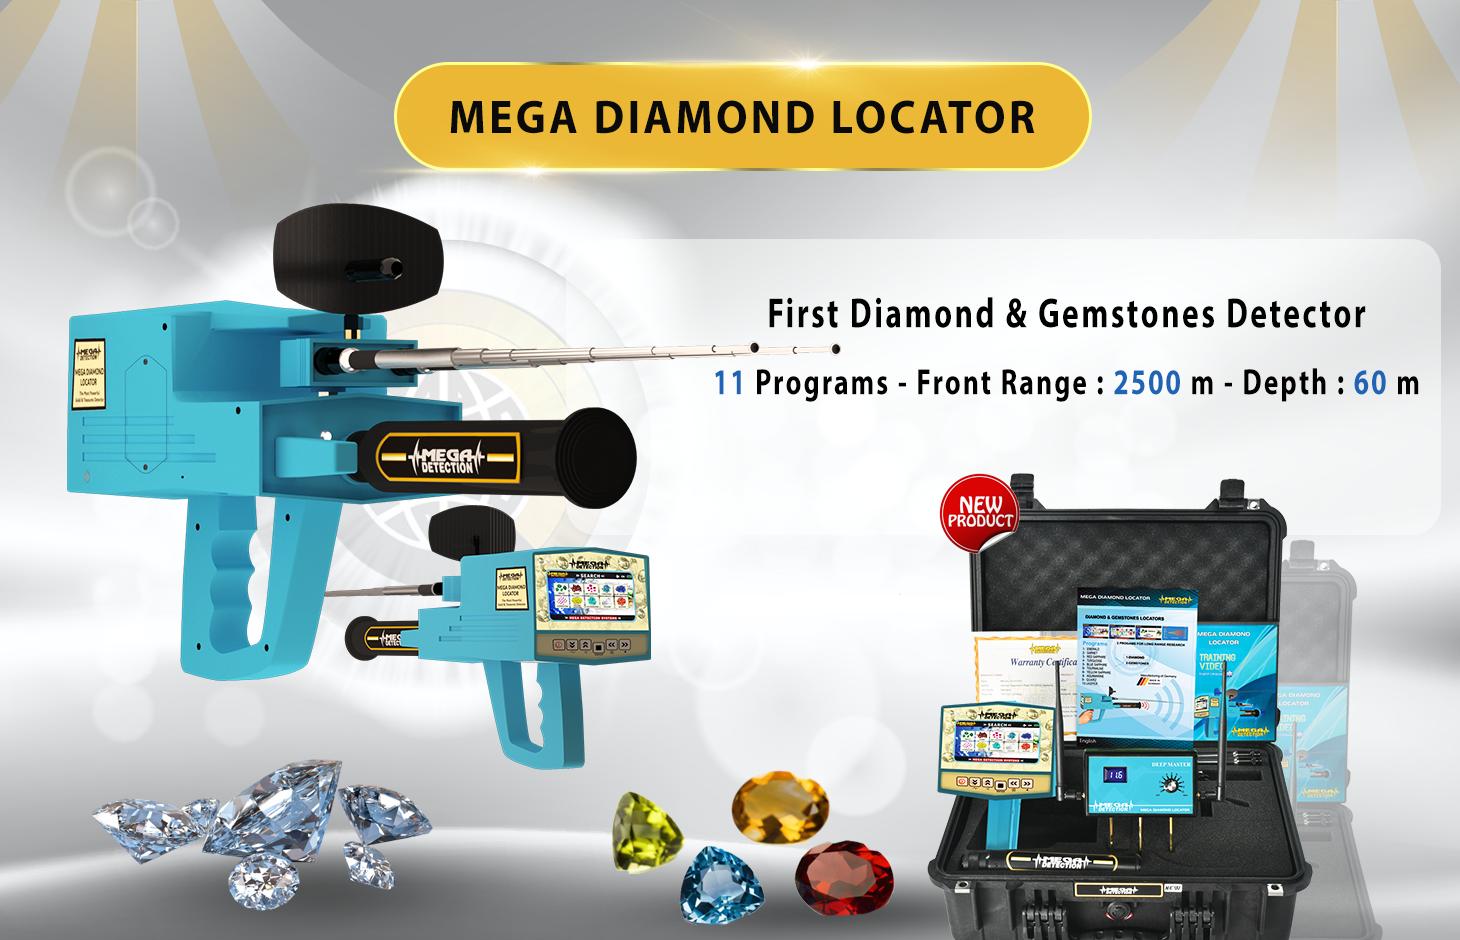 Mega Diamond Locator Long Rang Locators Systems Gold Detectors Detector Professional Metal Detecting Range